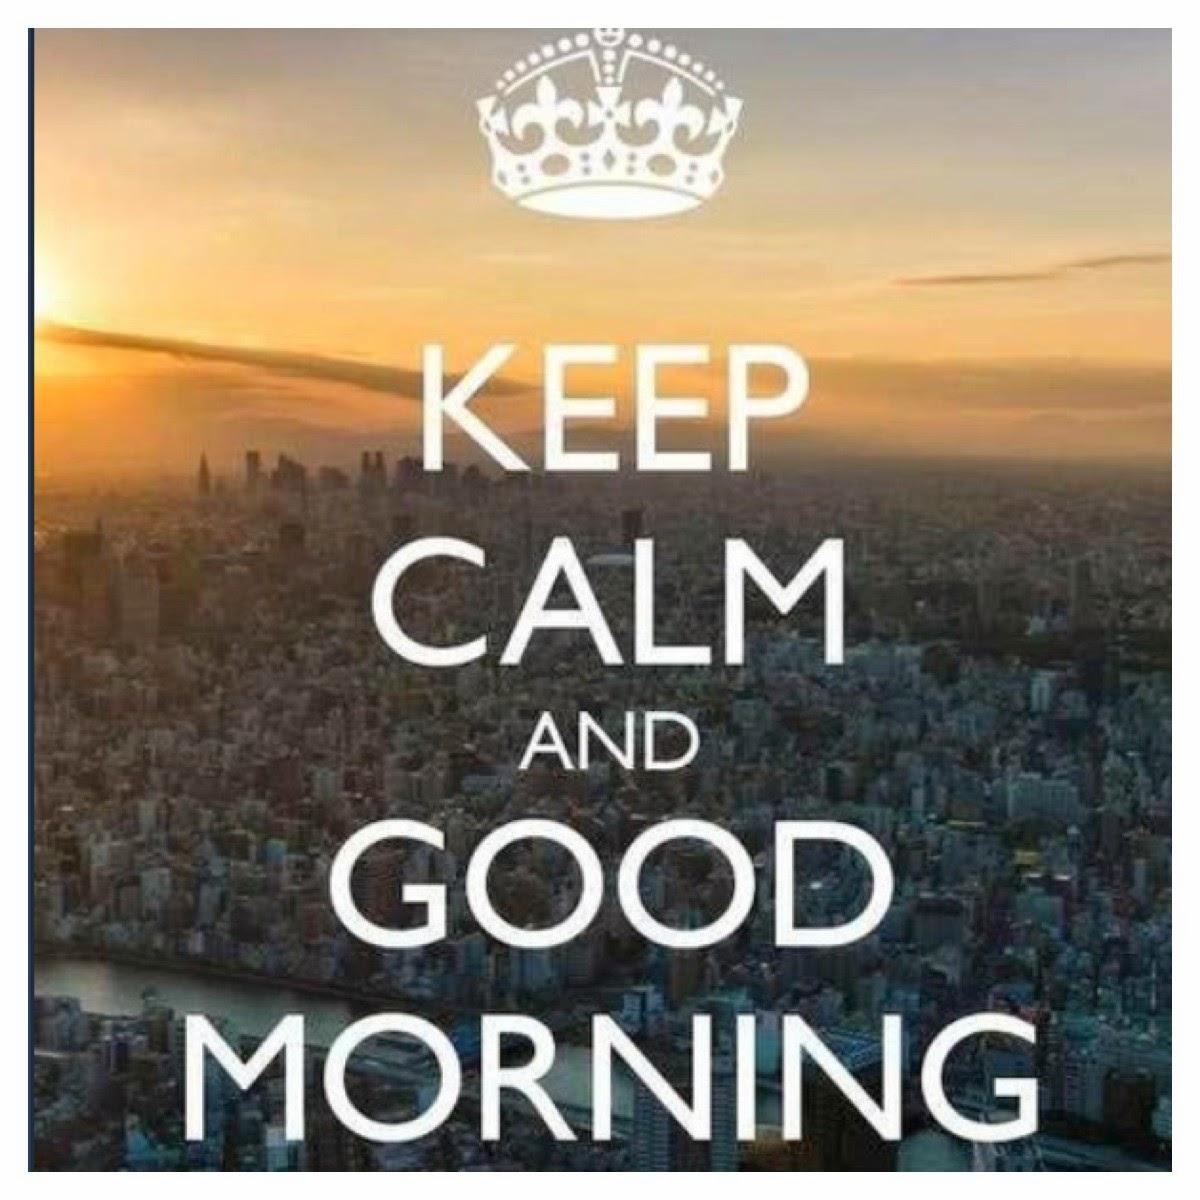 Kata Kata Selamat Pagi Bhs Inggris